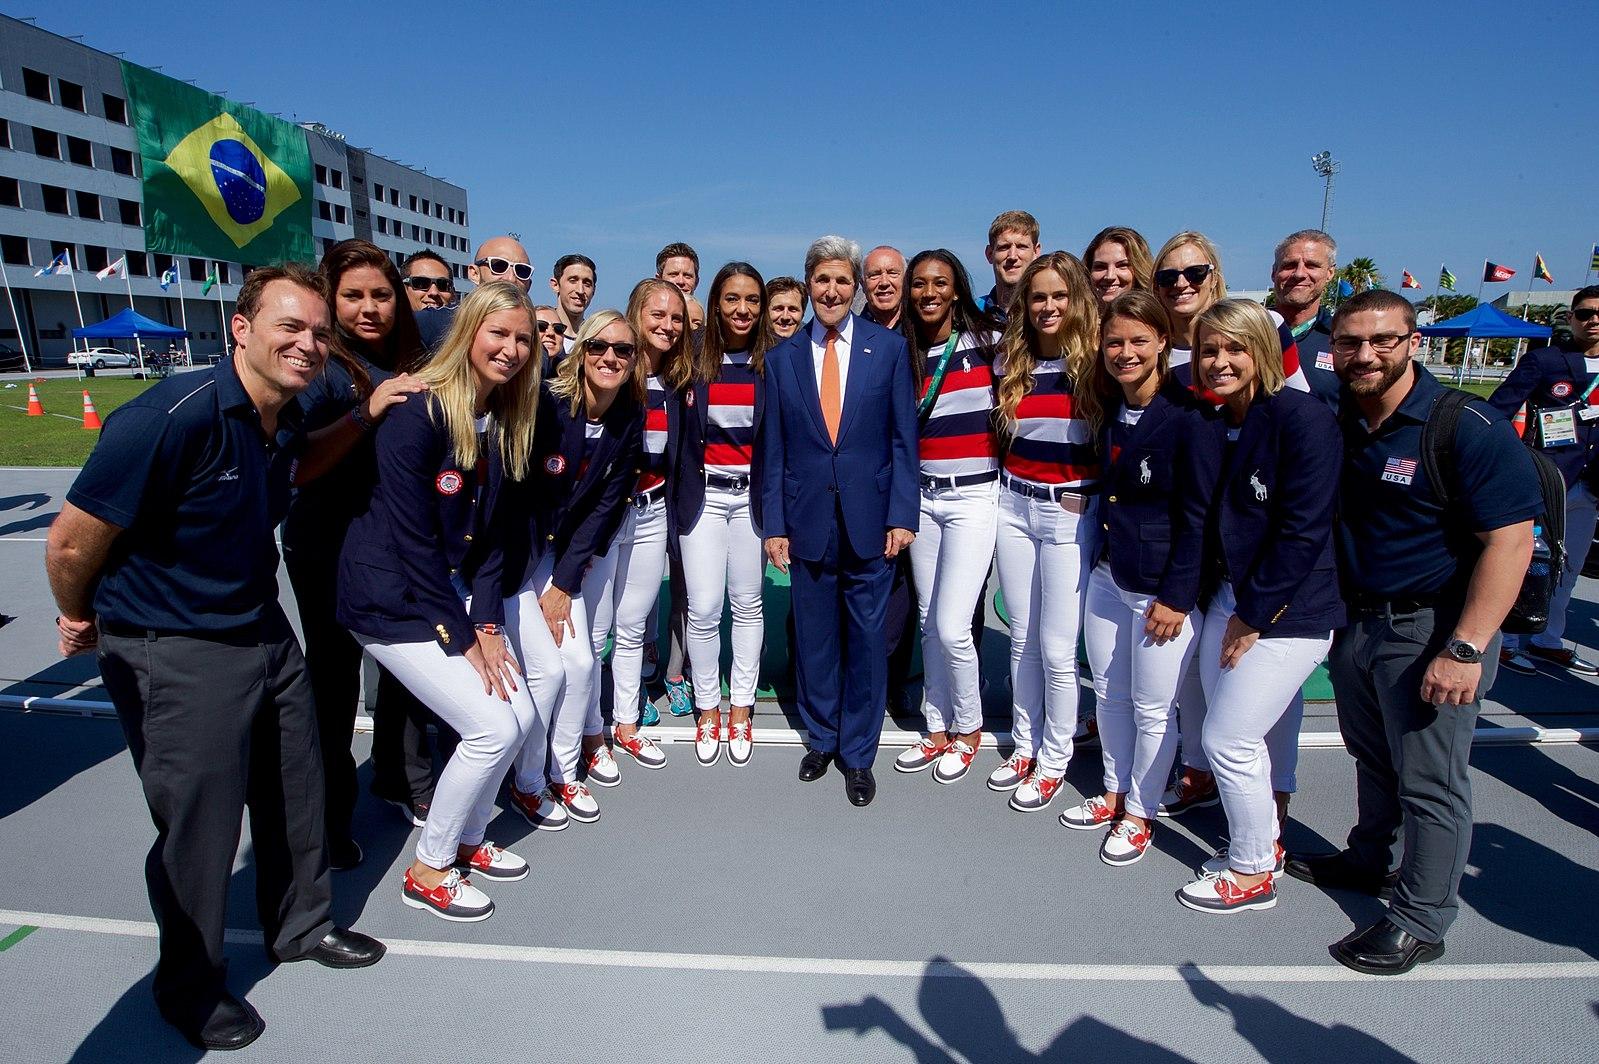 redhead-milf-ethnic-representation-olympics-us-team-hair